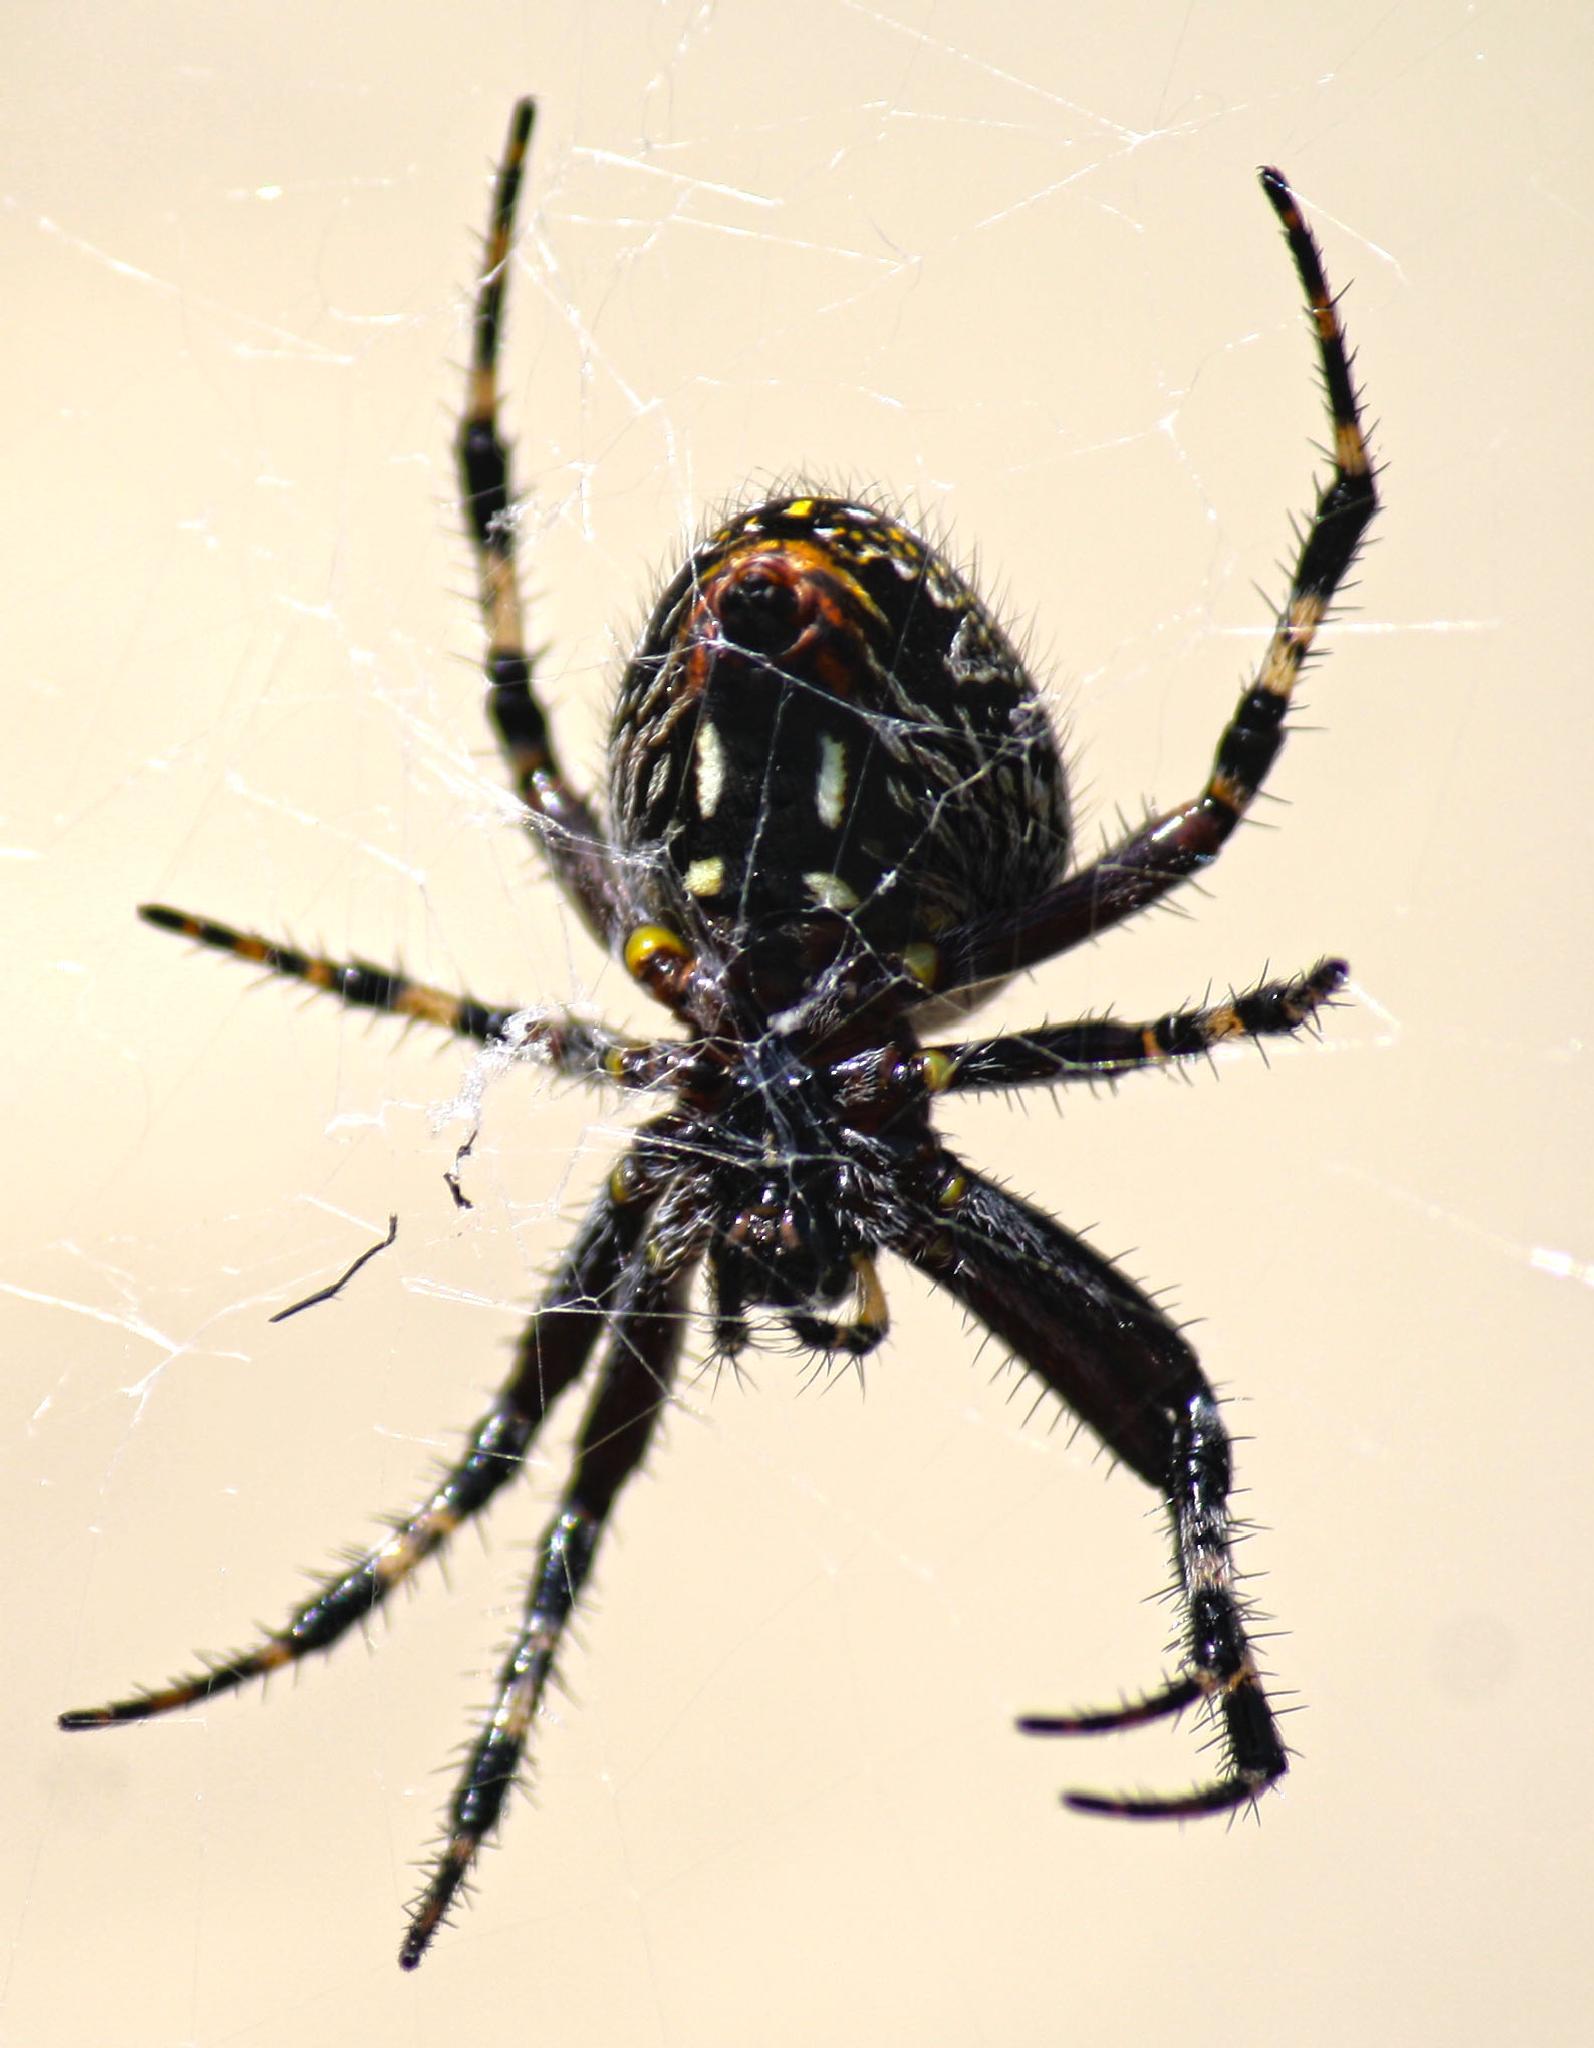 Aztec Spider by i_b